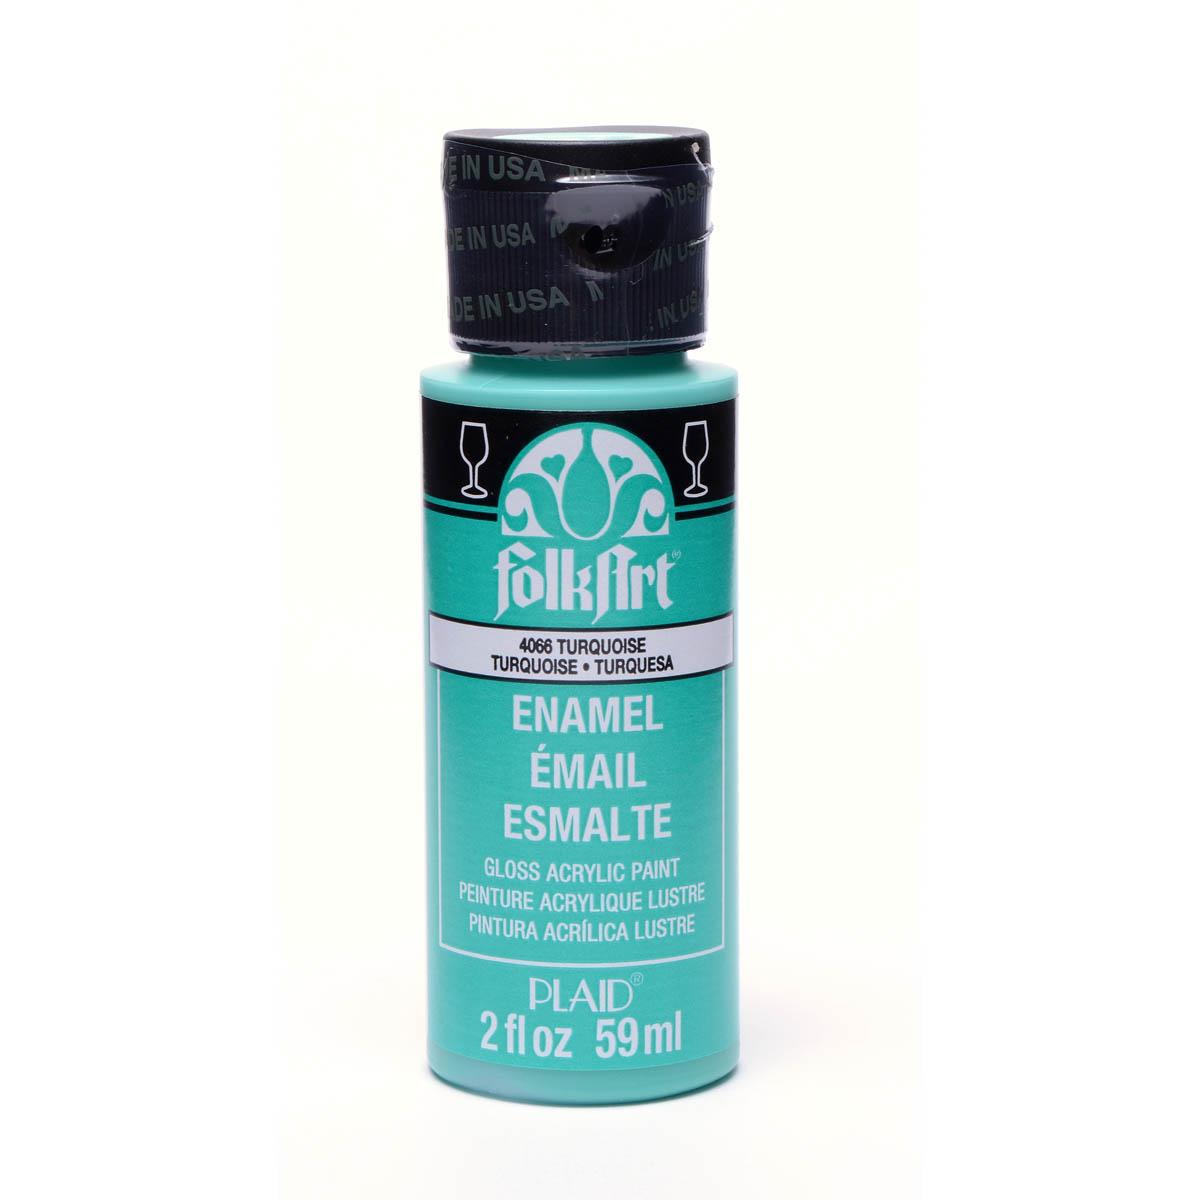 FolkArt ® Enamels™ - Turquoise, 2 oz. - 4066